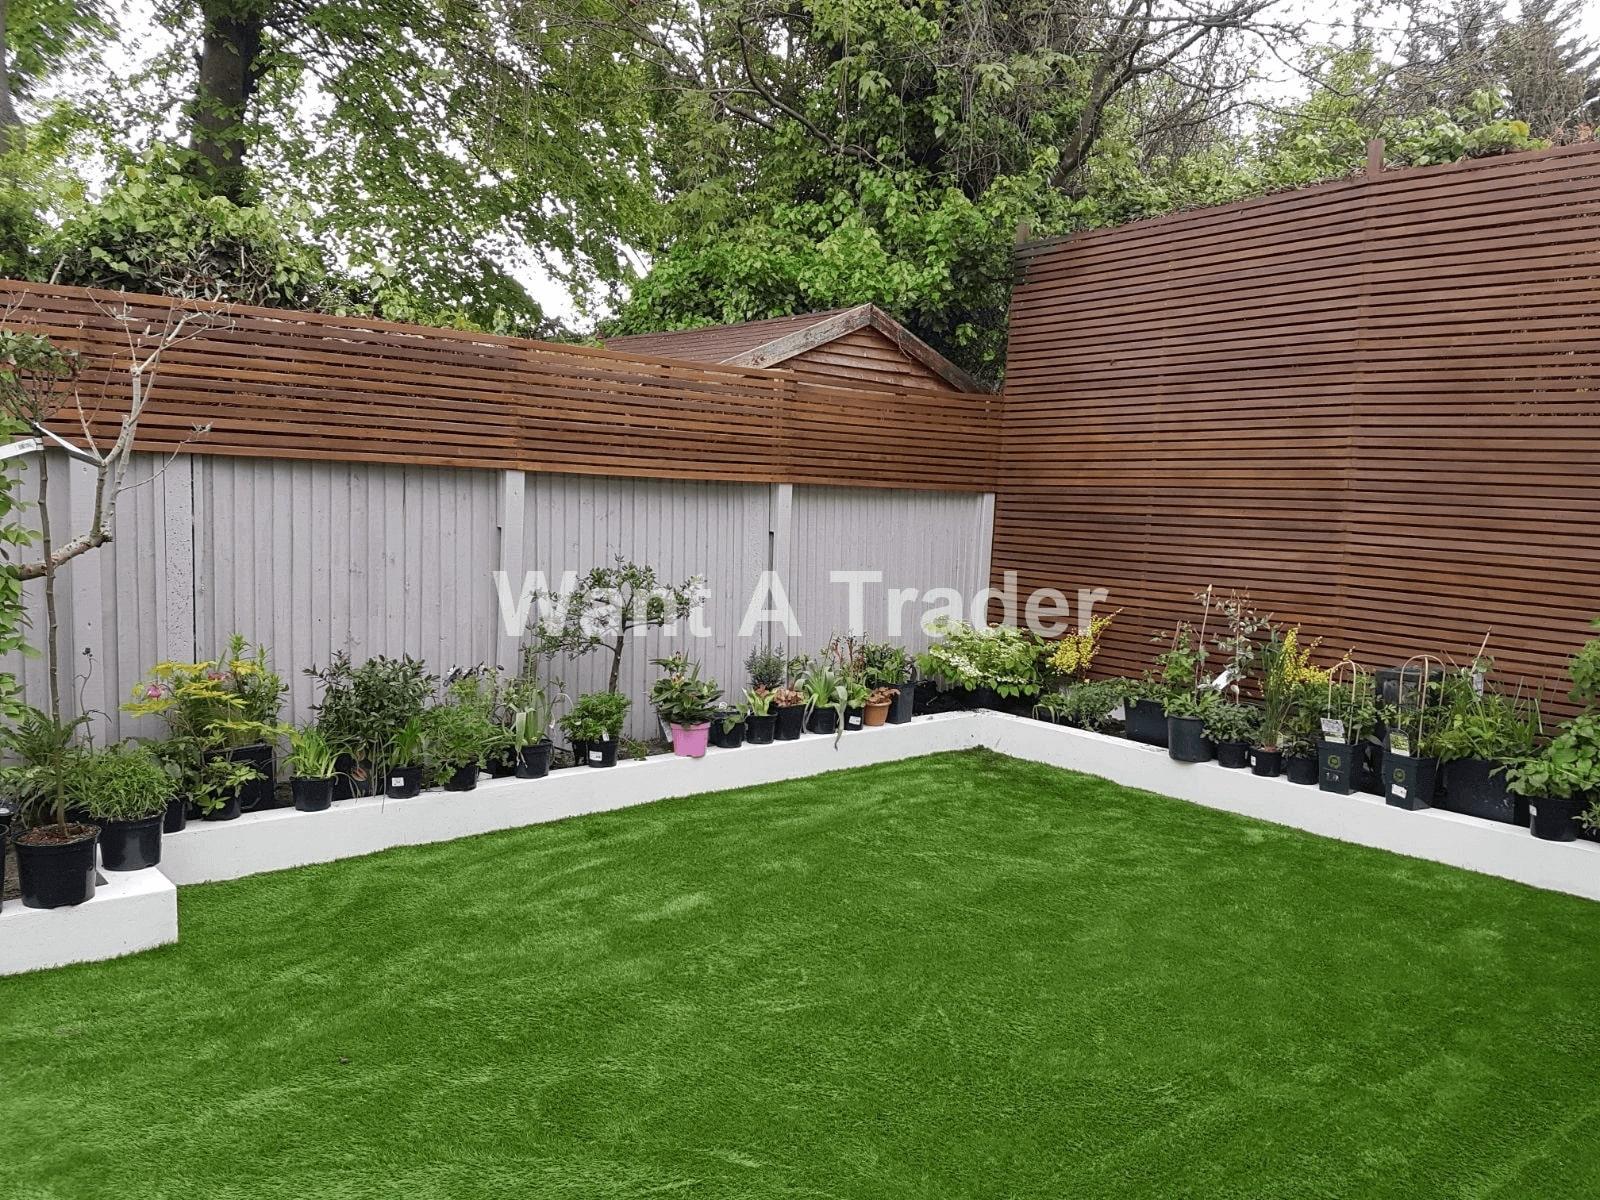 Garden Fencing Company Croydon CR0